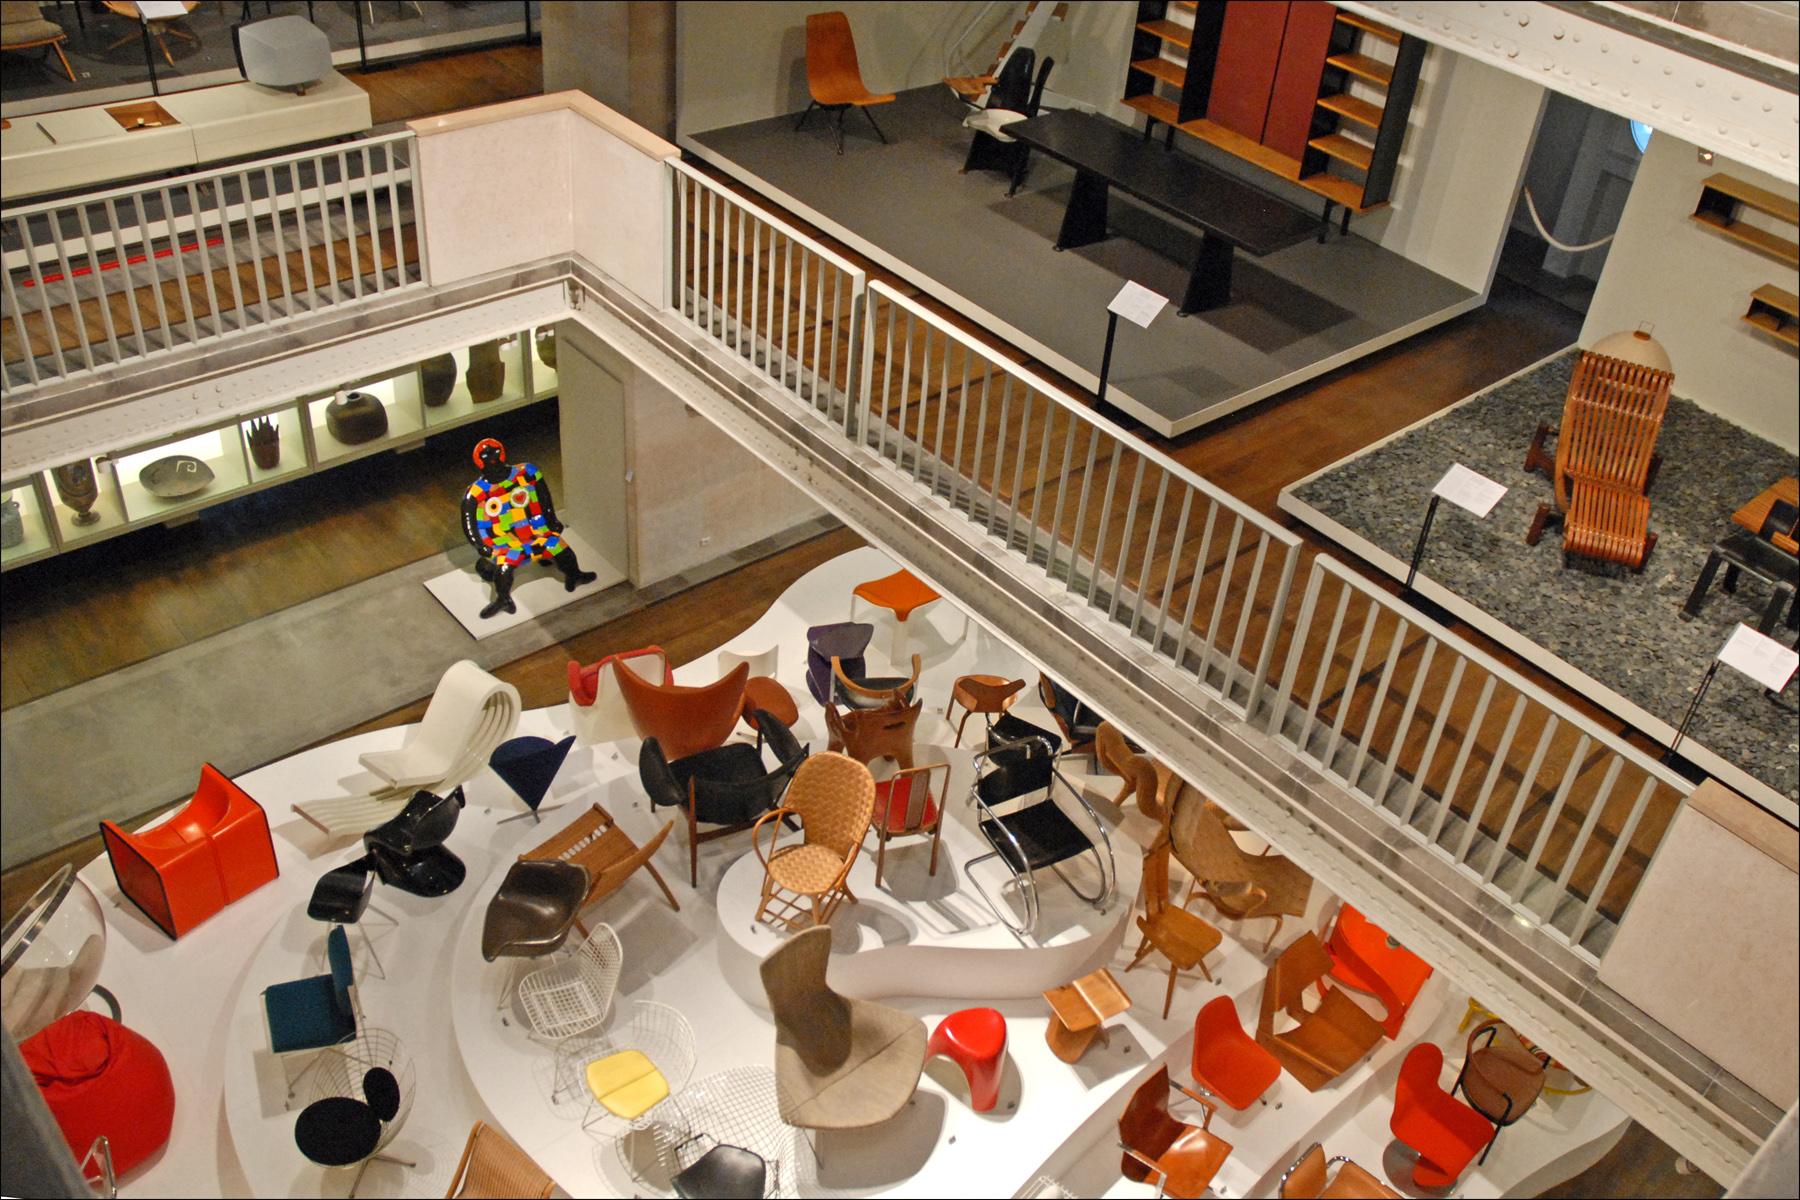 file le mus e des arts d wikimedia commons. Black Bedroom Furniture Sets. Home Design Ideas